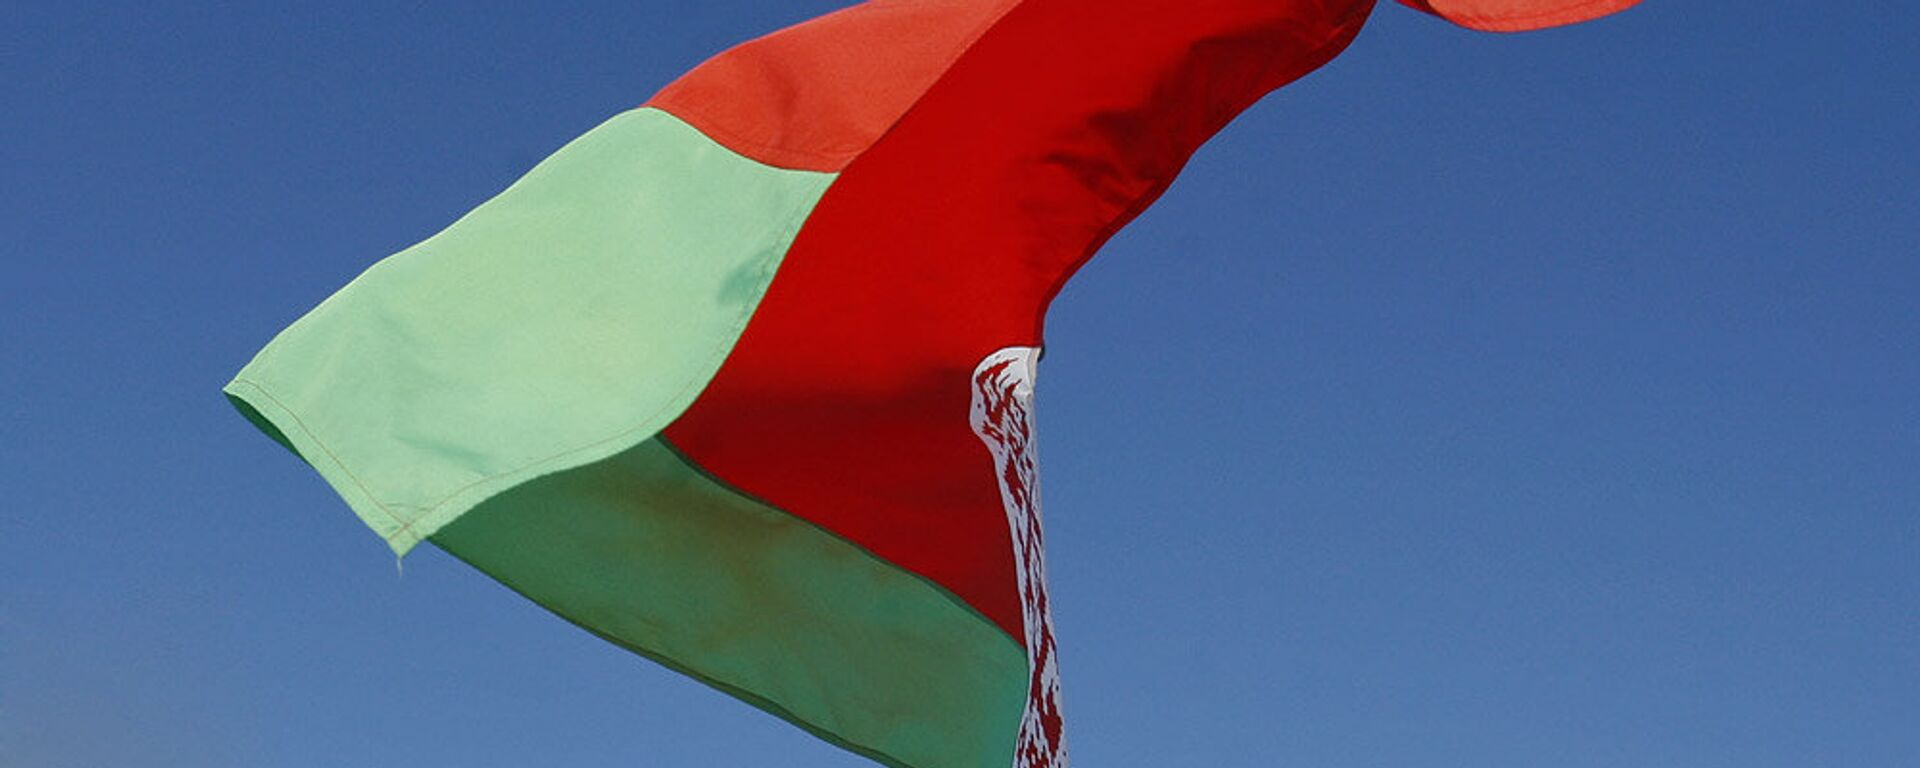 Bandera de Bielorrusia - Sputnik Mundo, 1920, 22.06.2021